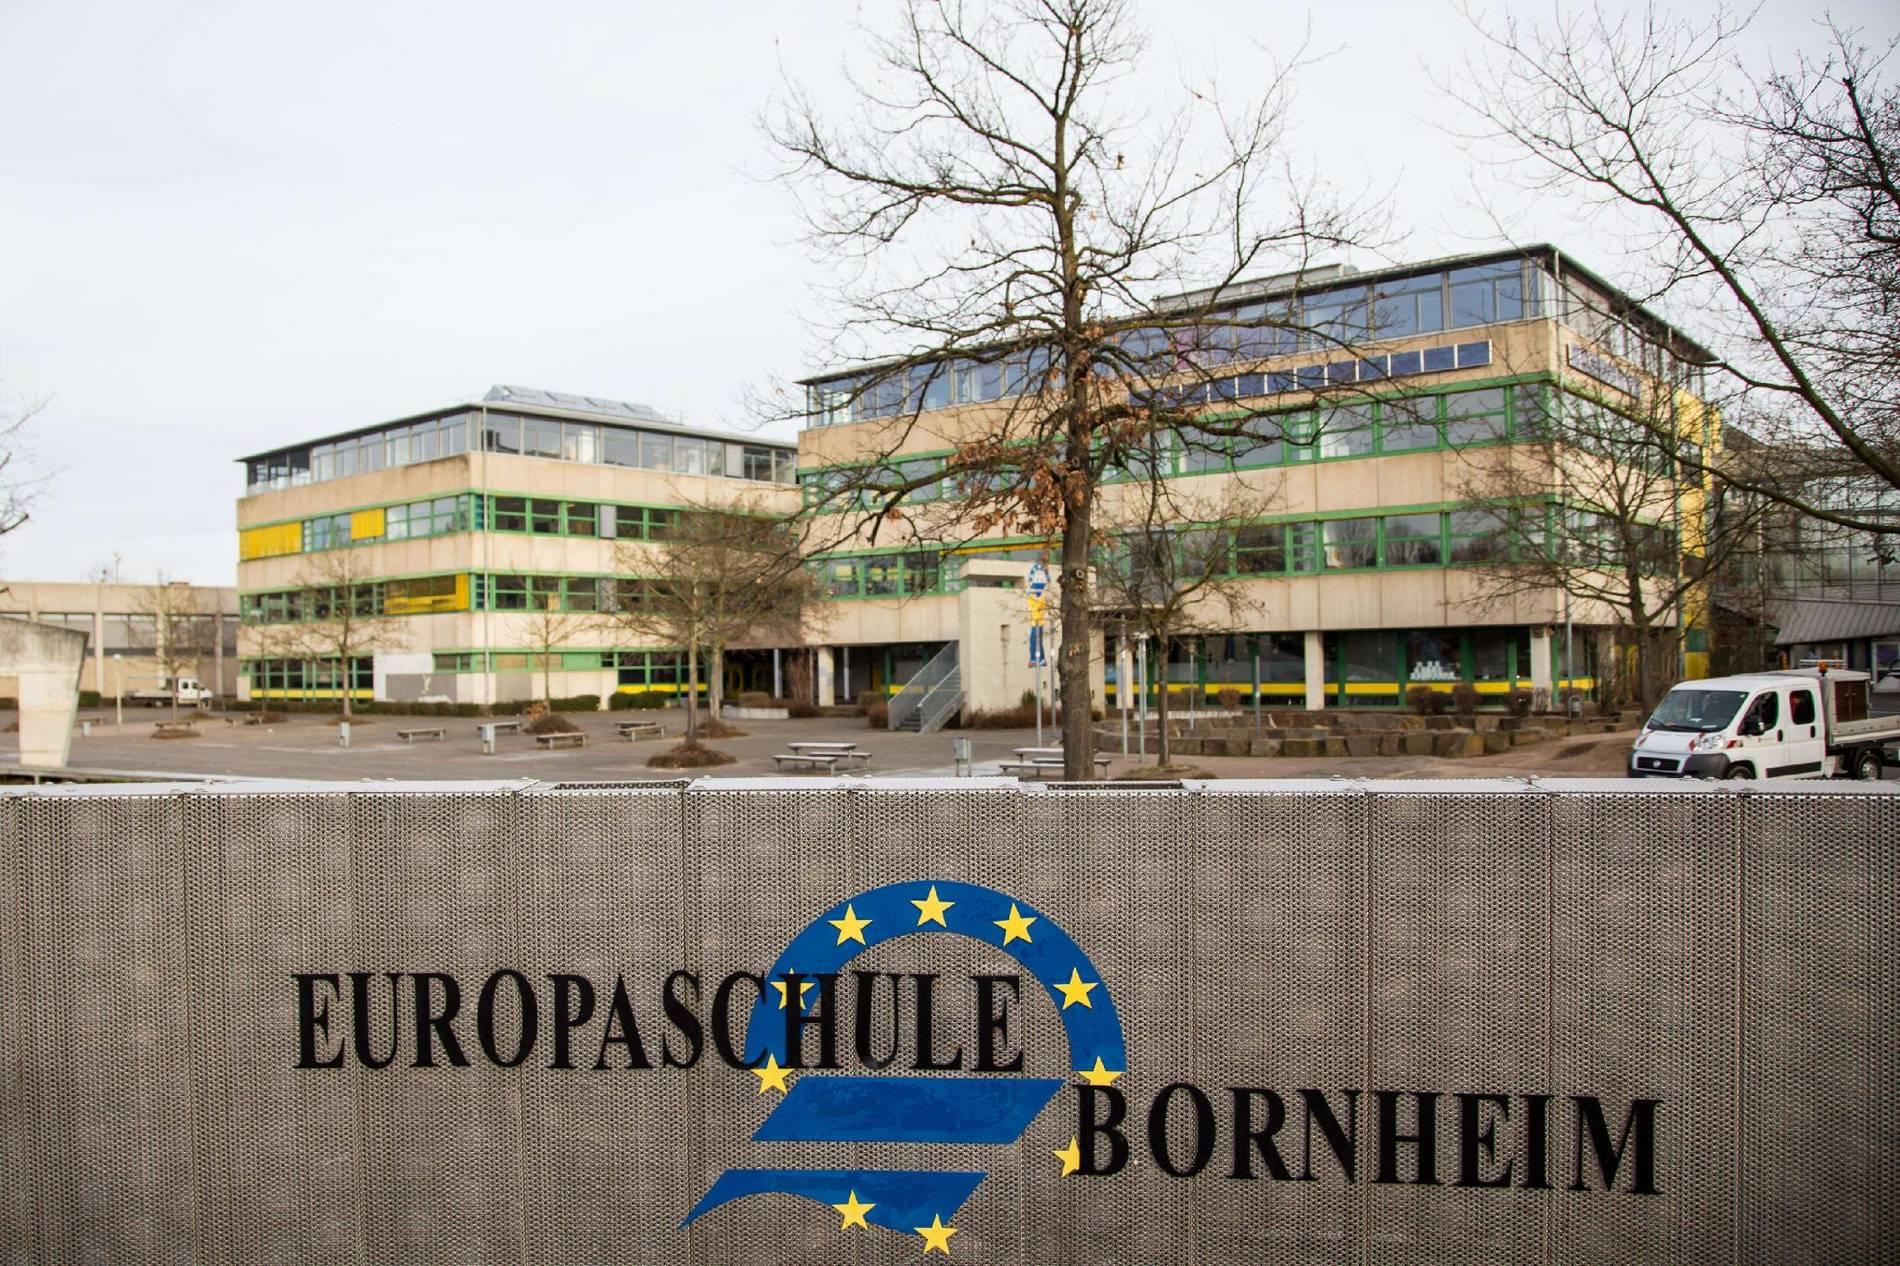 Europaschule-Bornheim